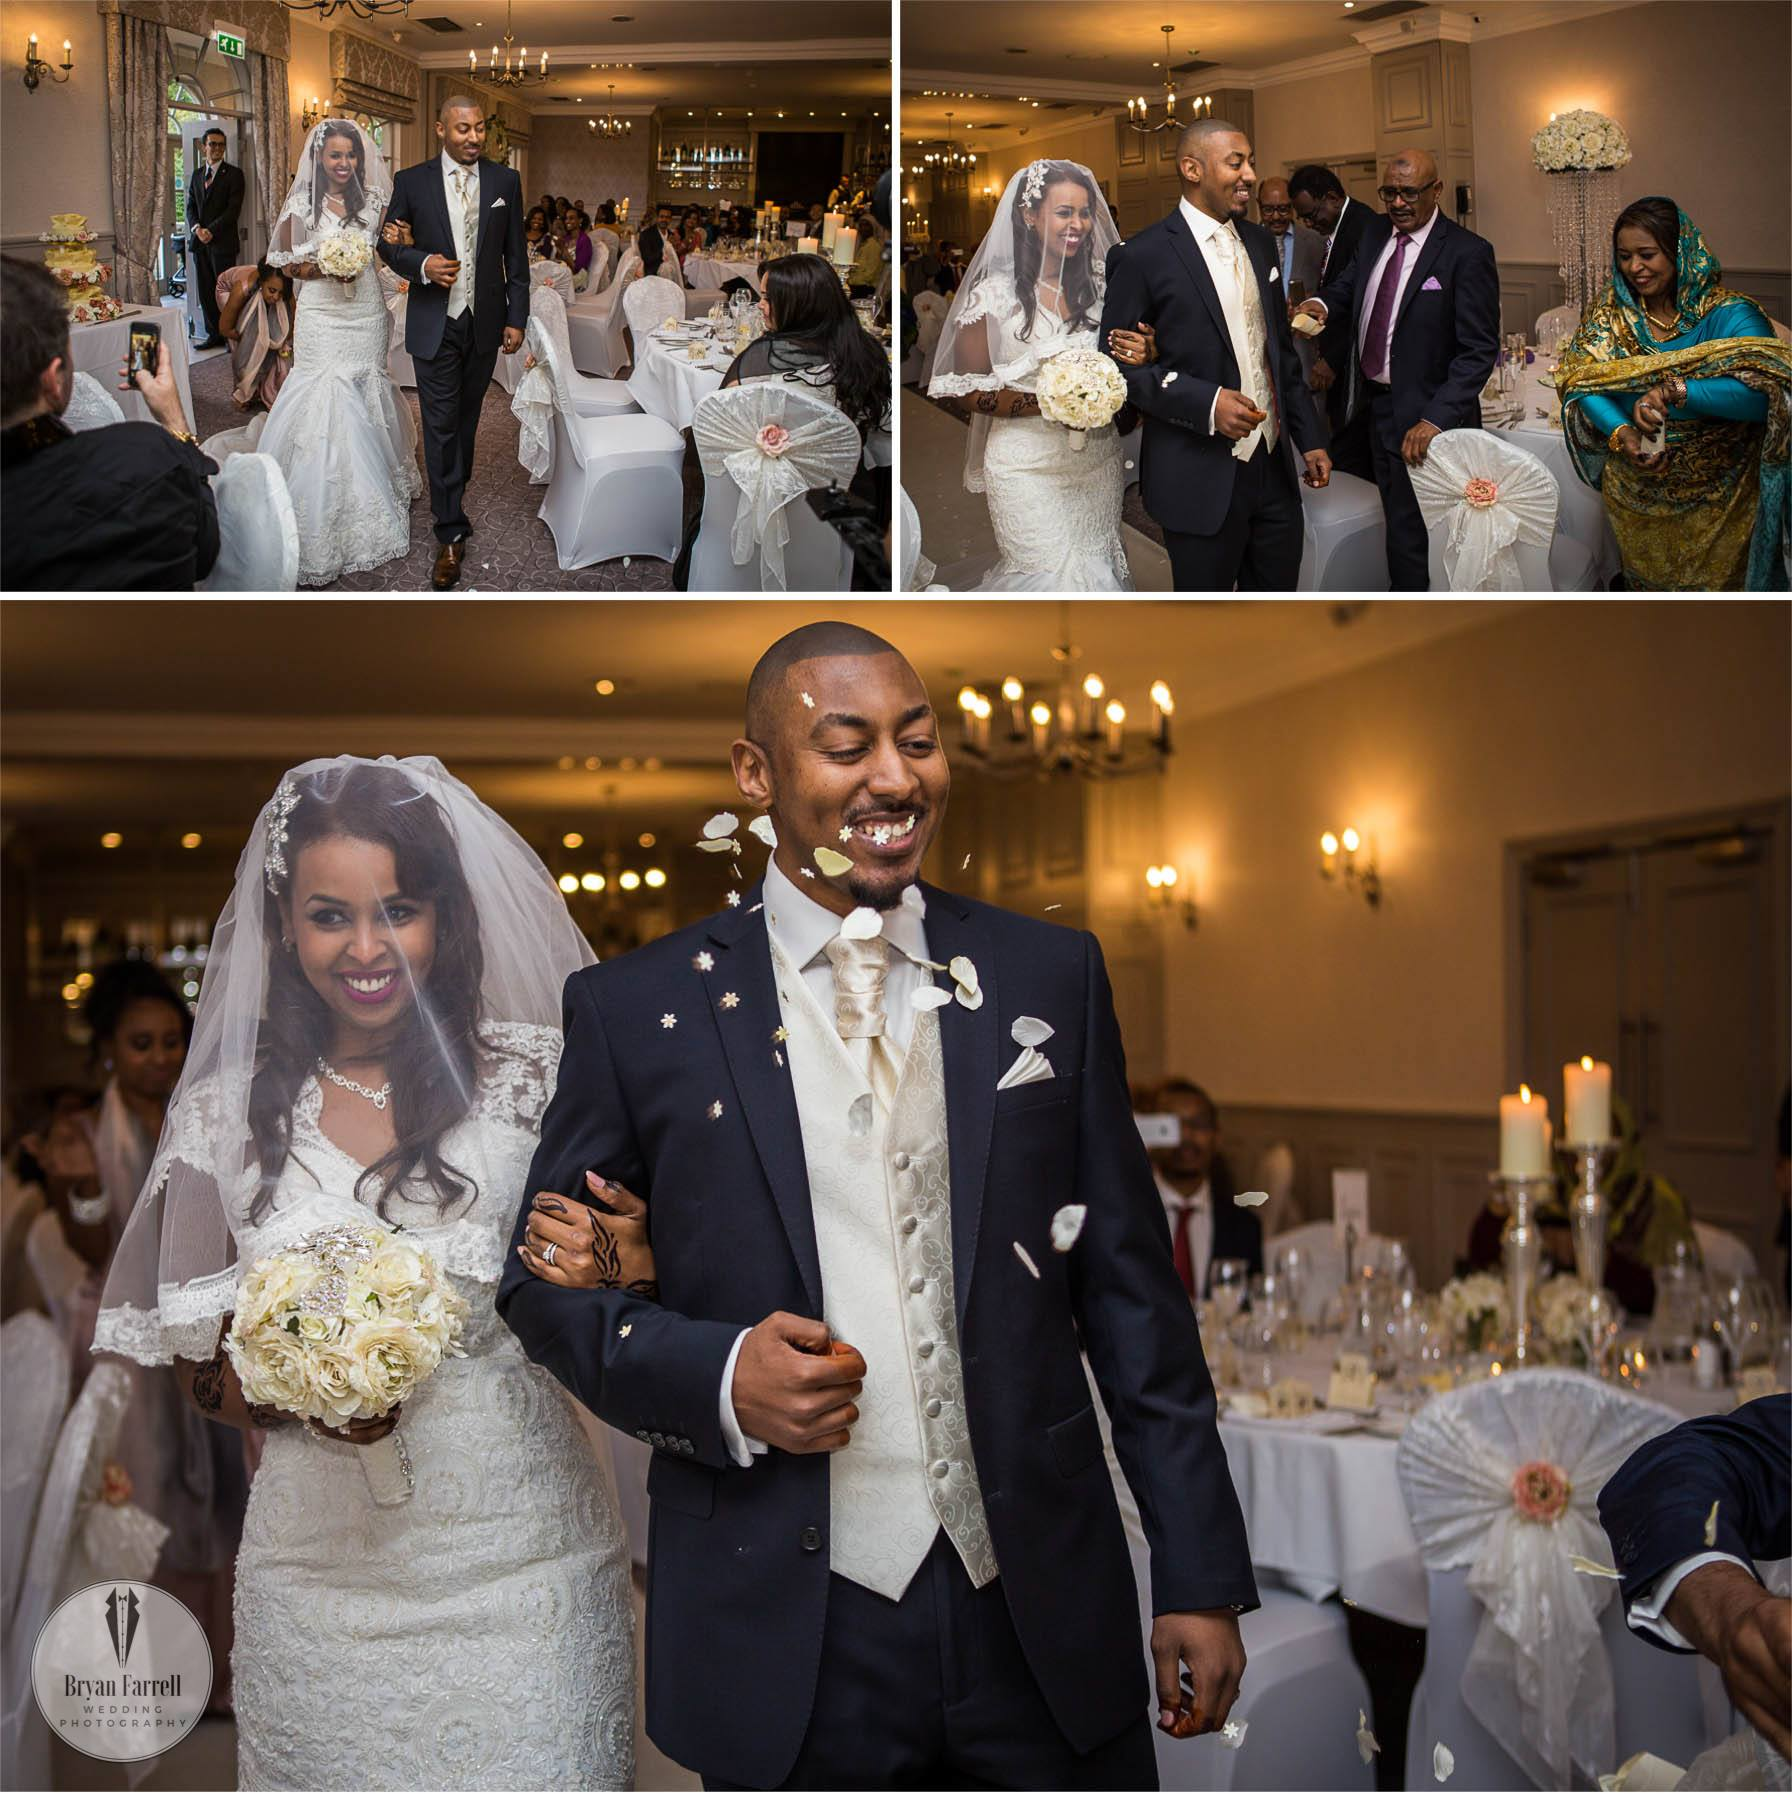 Mottram Hall Wedding 37 1